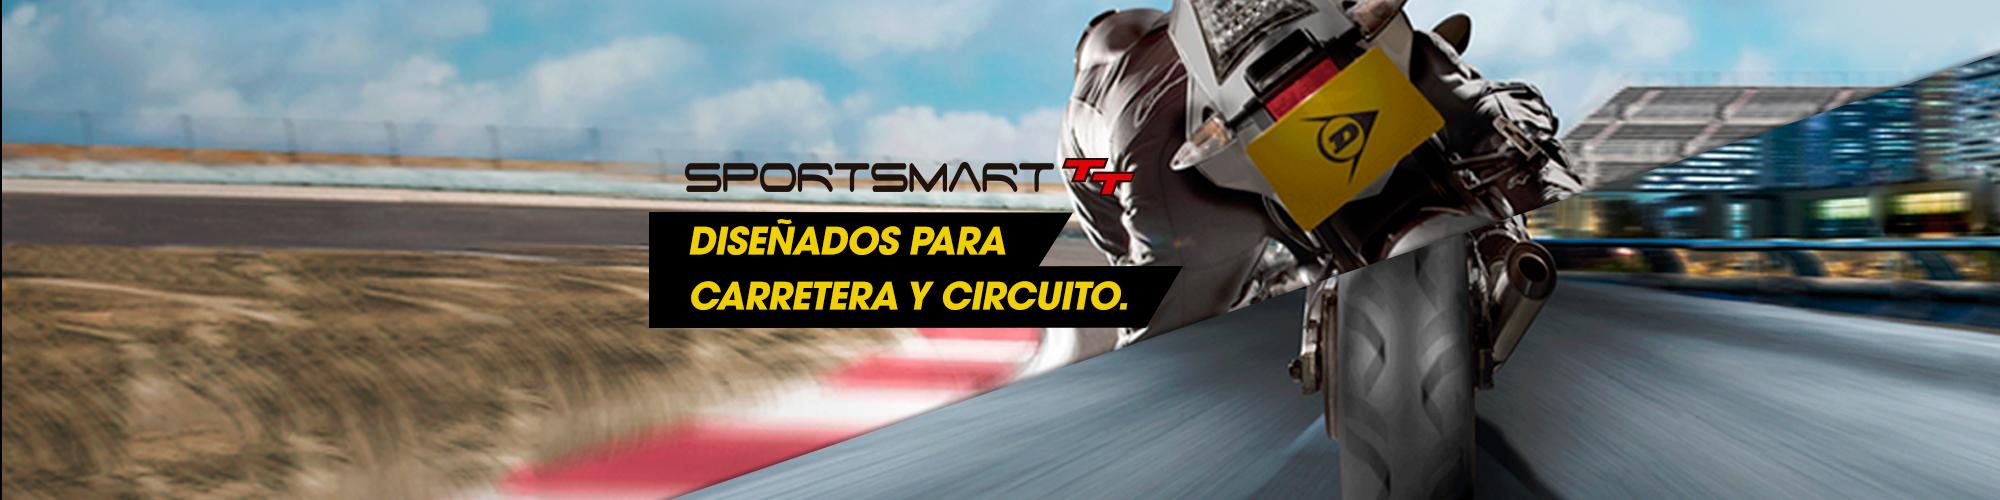 Sportsmart2 MAX | Dunlop ES